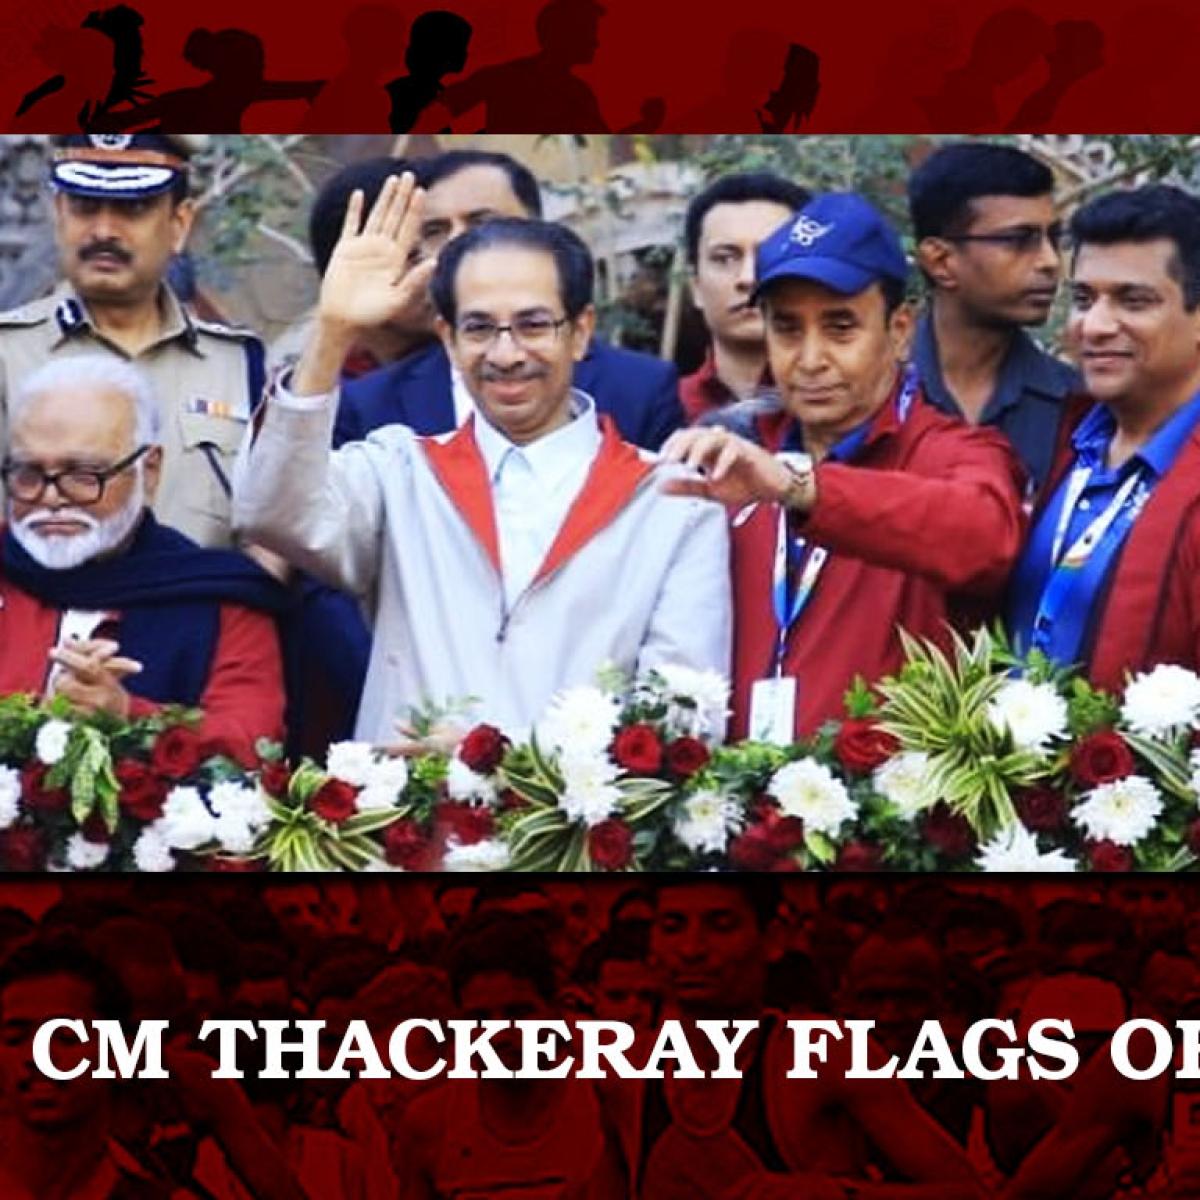 CM Uddhav Thackeray flags off Dream Run; Kiren Rijiju, Aaditya Thackeray, encourage runners